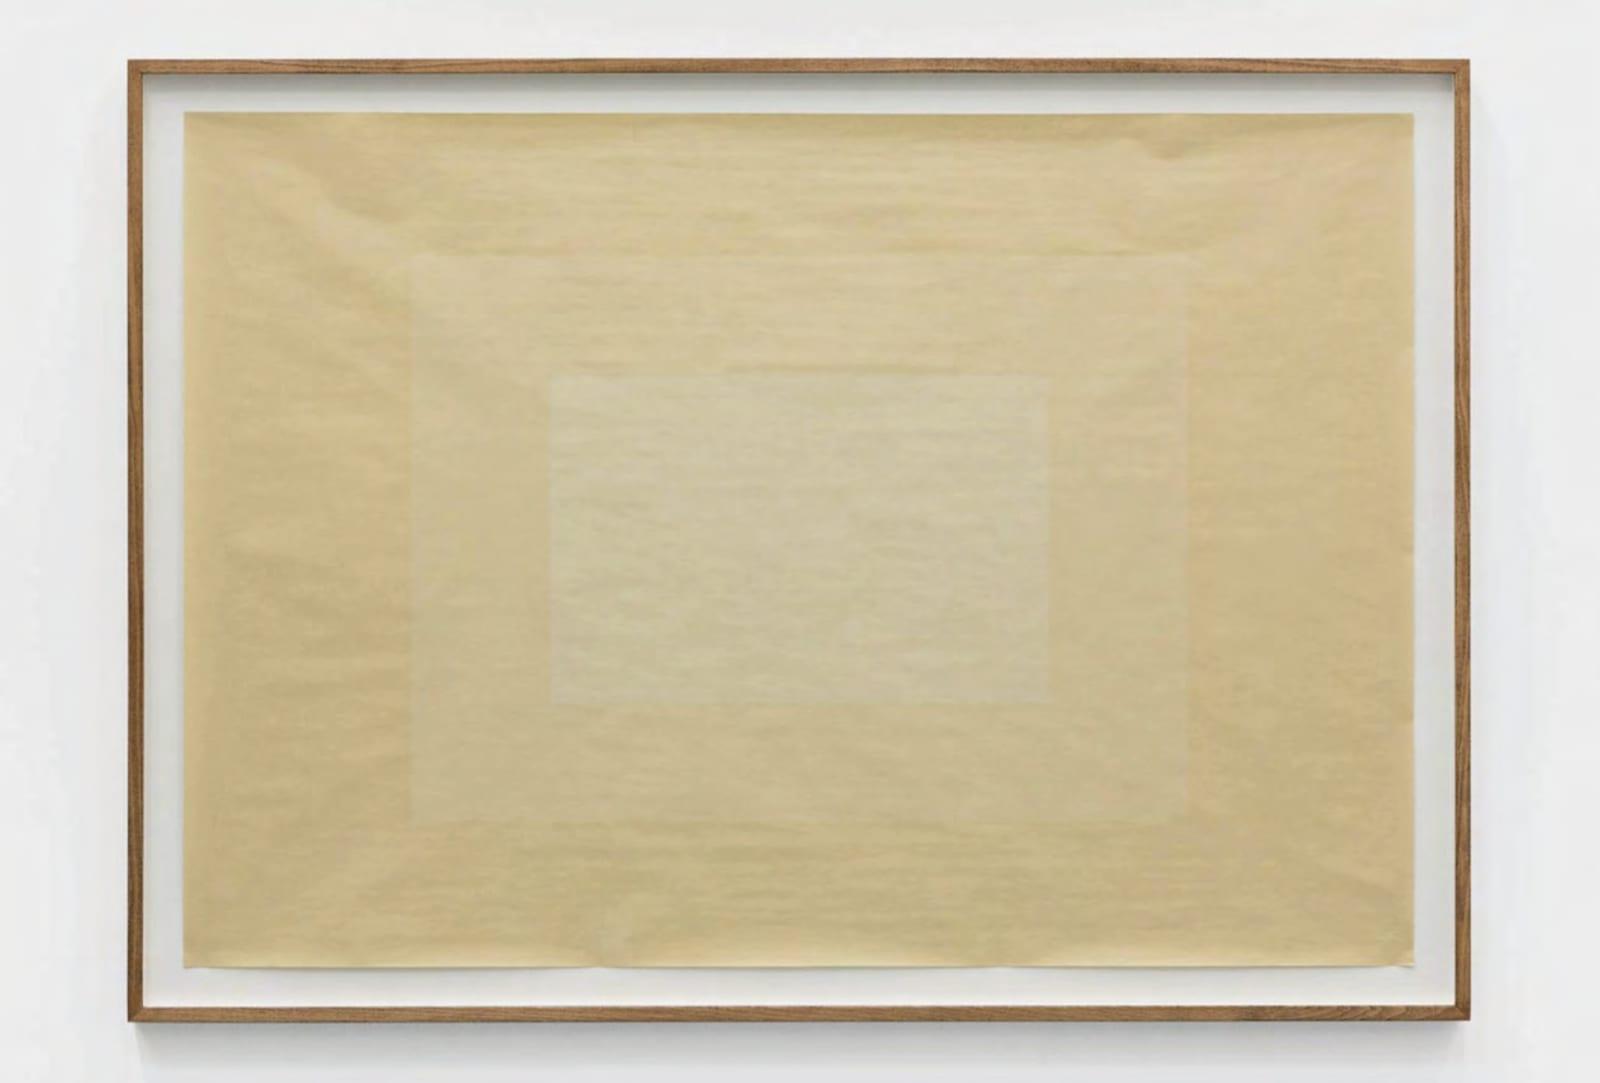 Charbel-joseph H. Boutros, Sun work, 2013